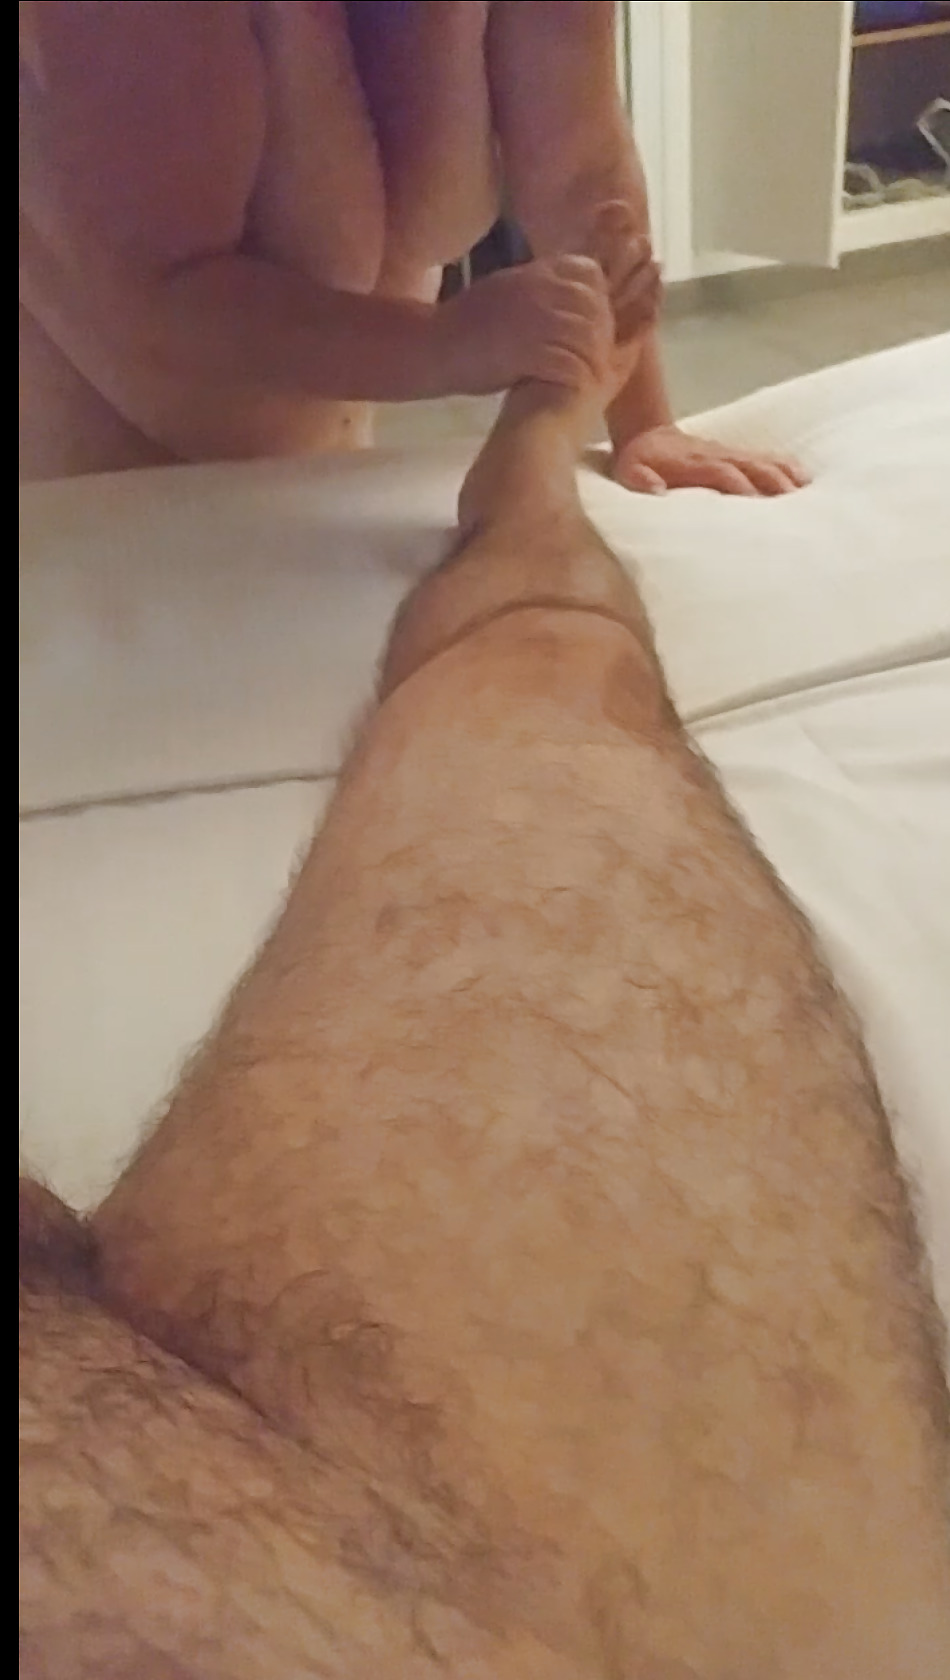 Tetuda preciosa da masaje a chico y se lo folla - 1 part 9